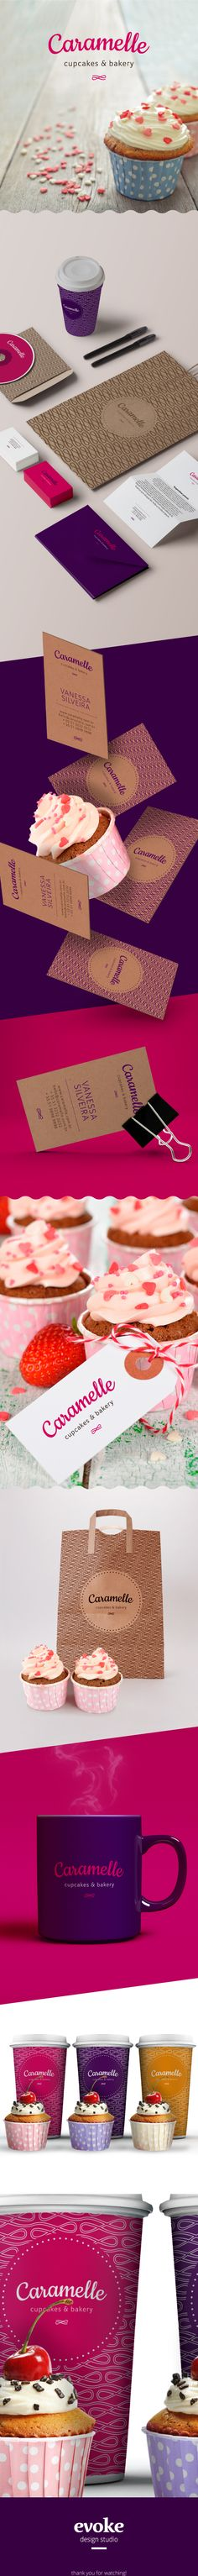 Caramelle - Cupcakes & Bakery on Behance